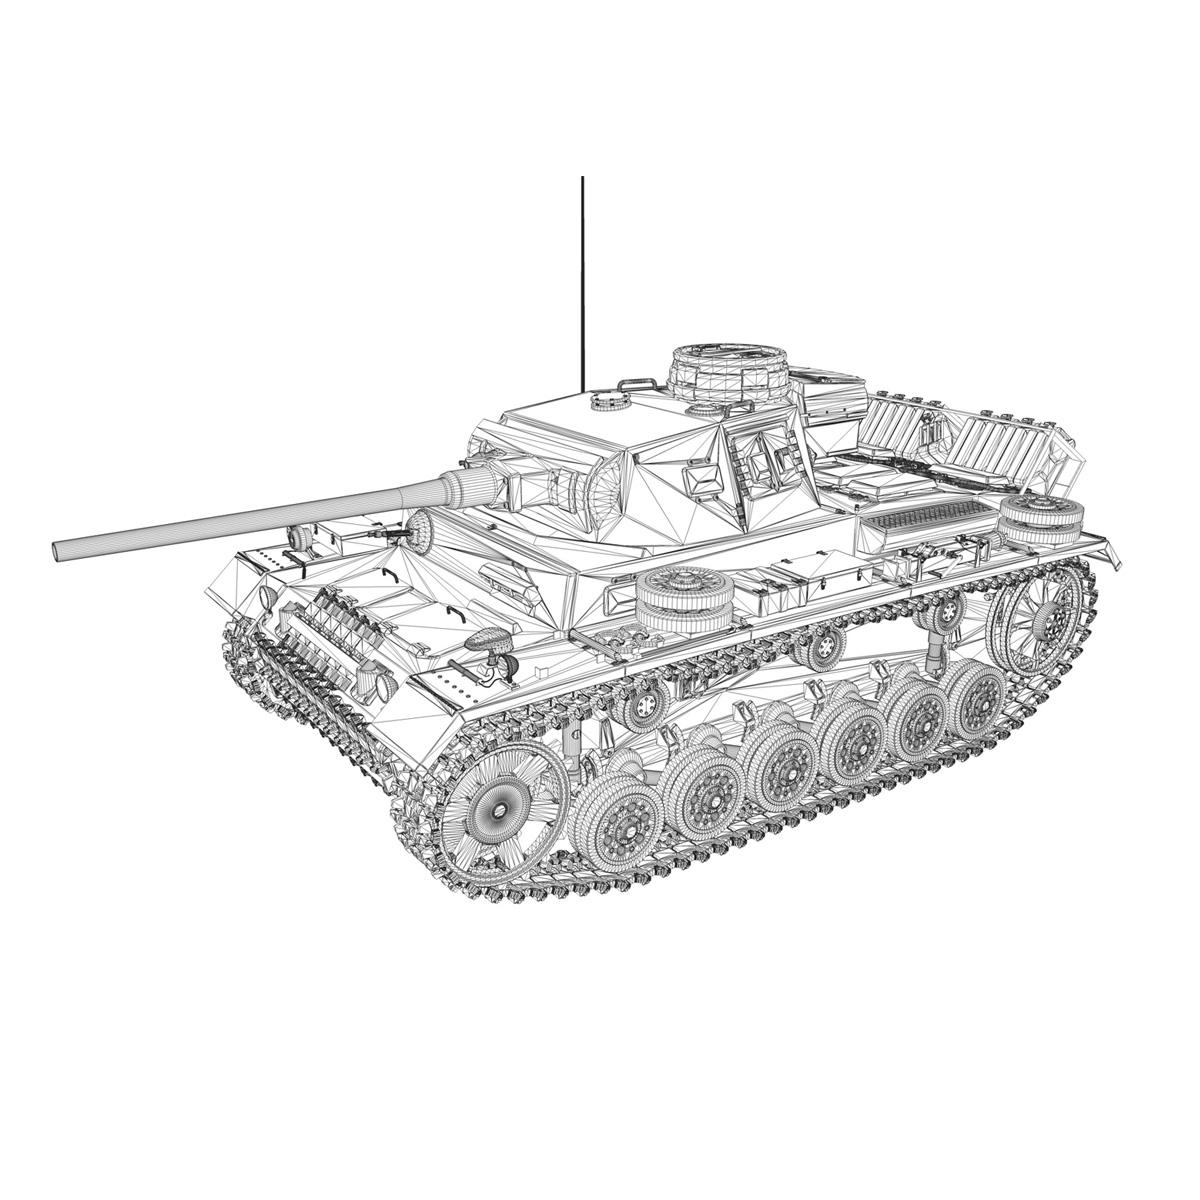 pzkpfw iii – panzerkampfwagen 3 – ausf.j – dak – 1 3d model 3ds fbx lwo lw lws obj c4d 265594